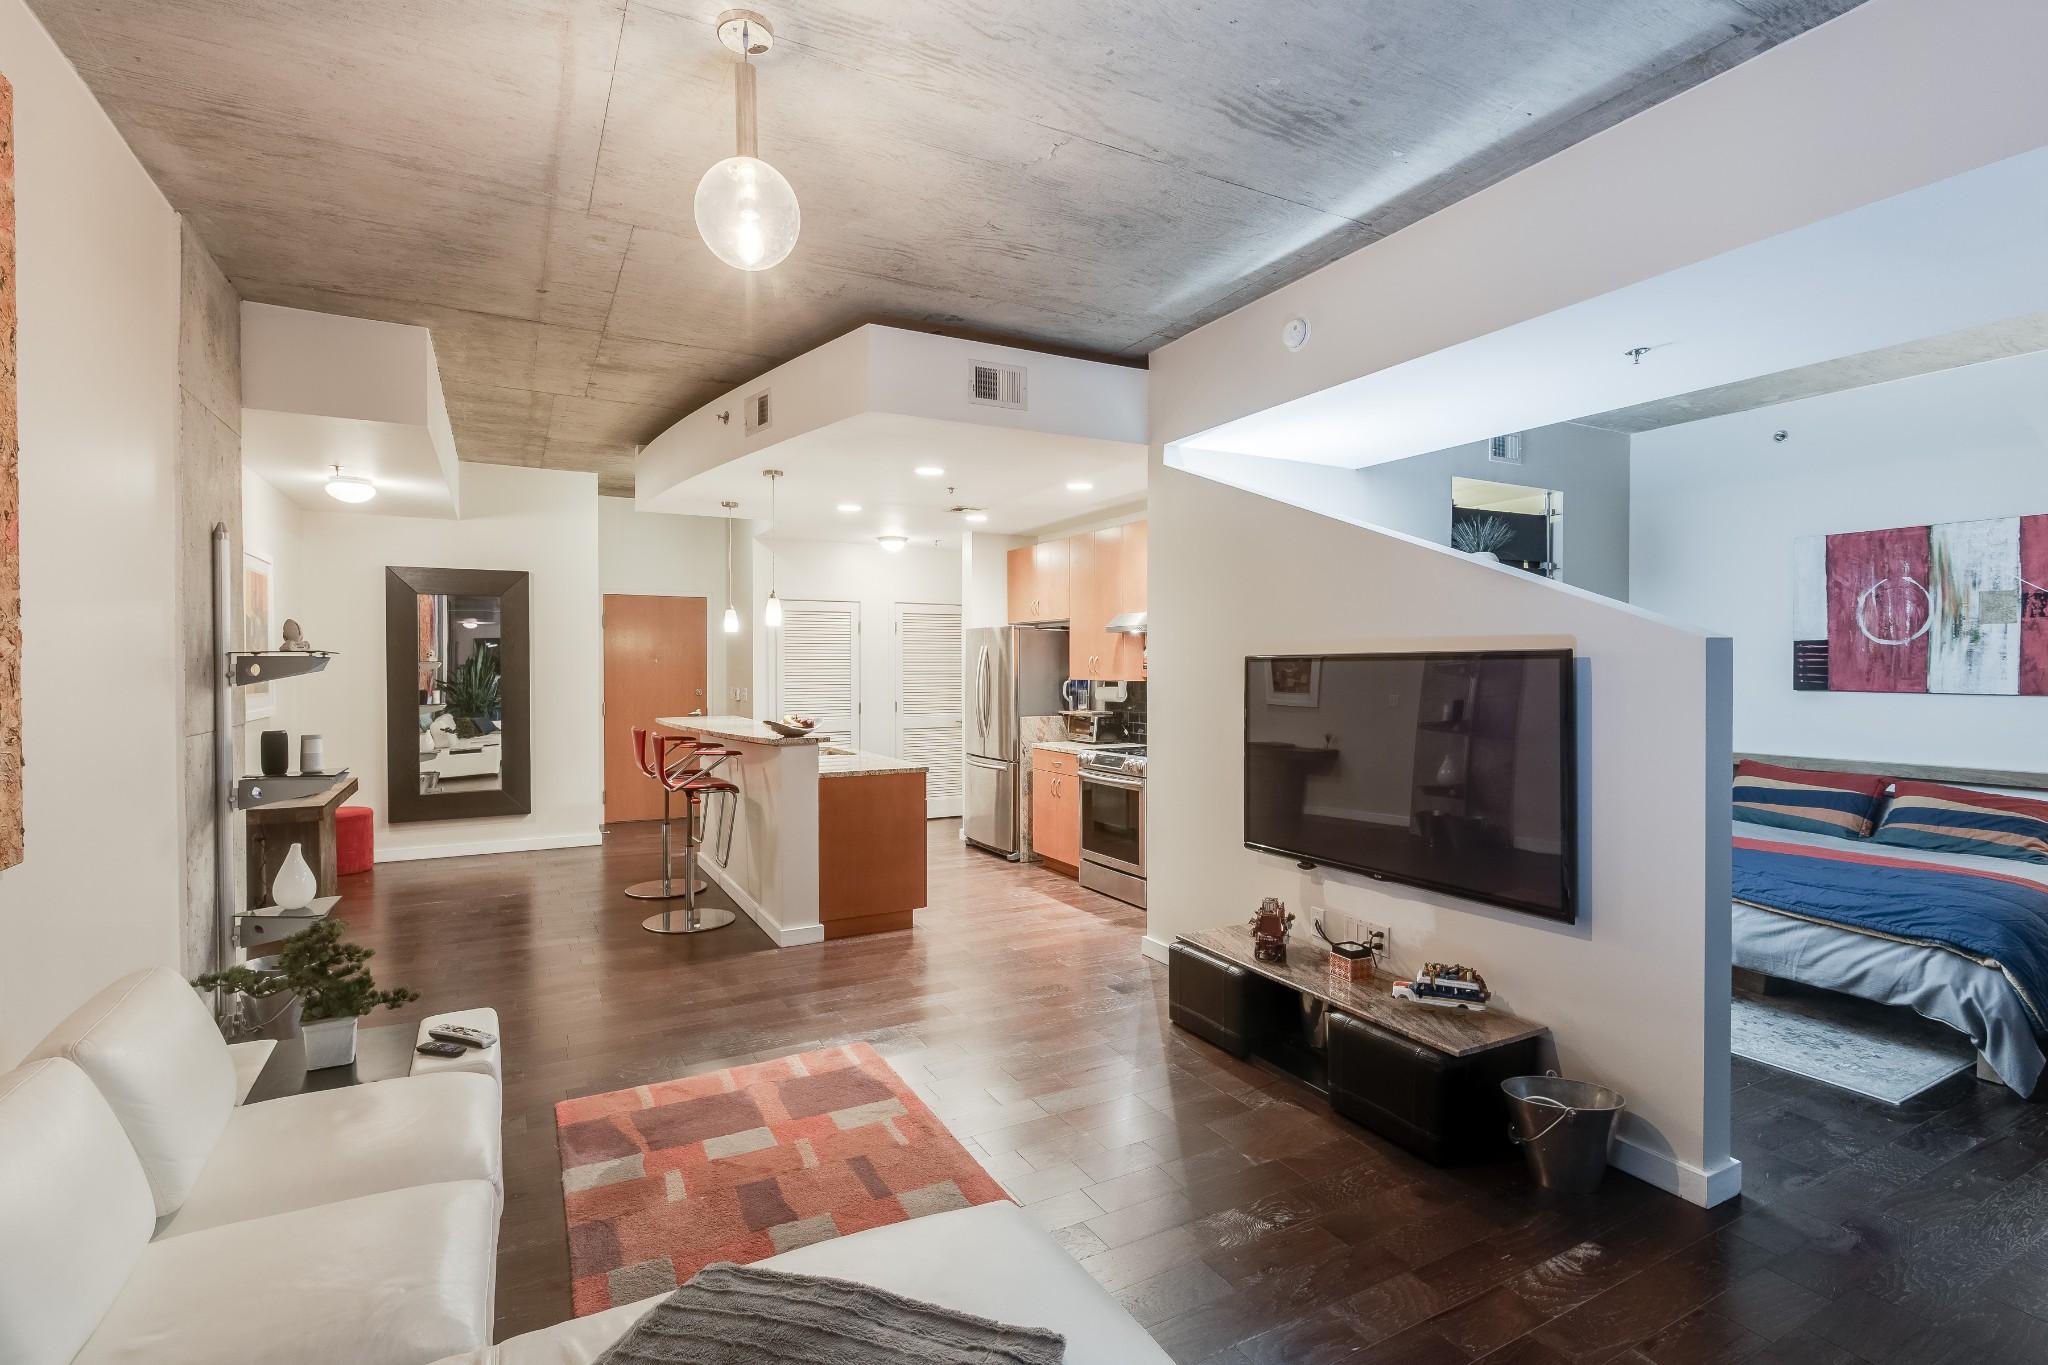 301 Demonbreun St, Unit 1015 Property Photo - Nashville, TN real estate listing